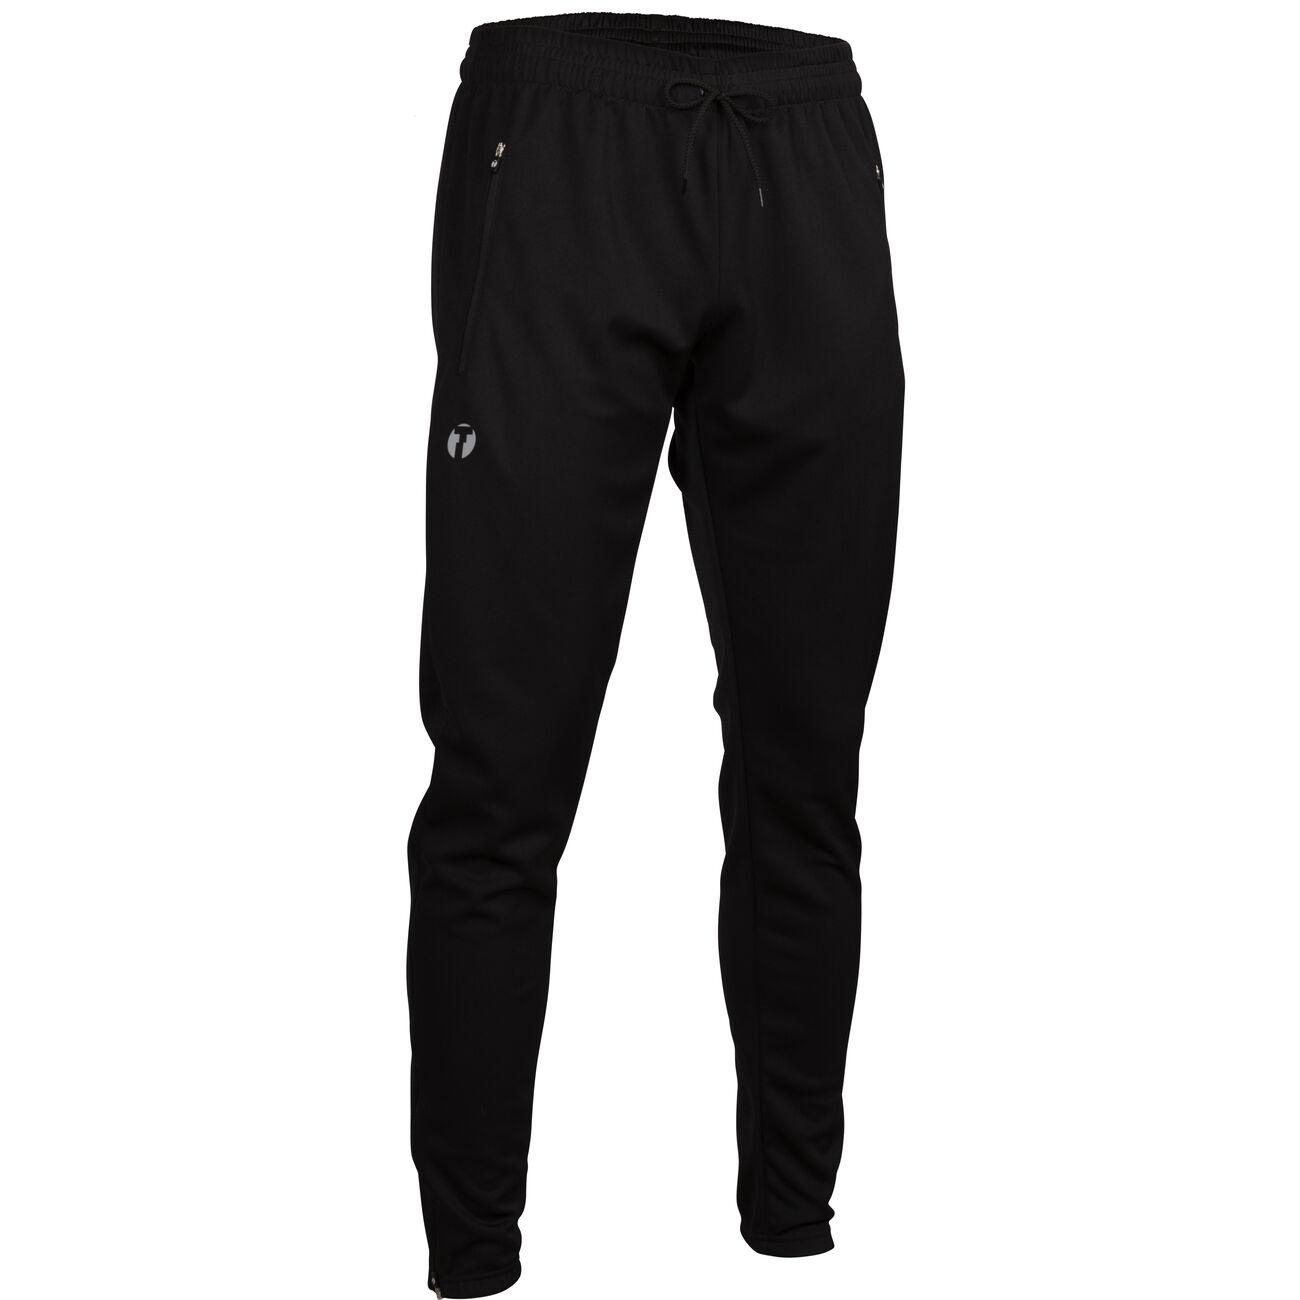 Fusion 2.0 Training pants junior